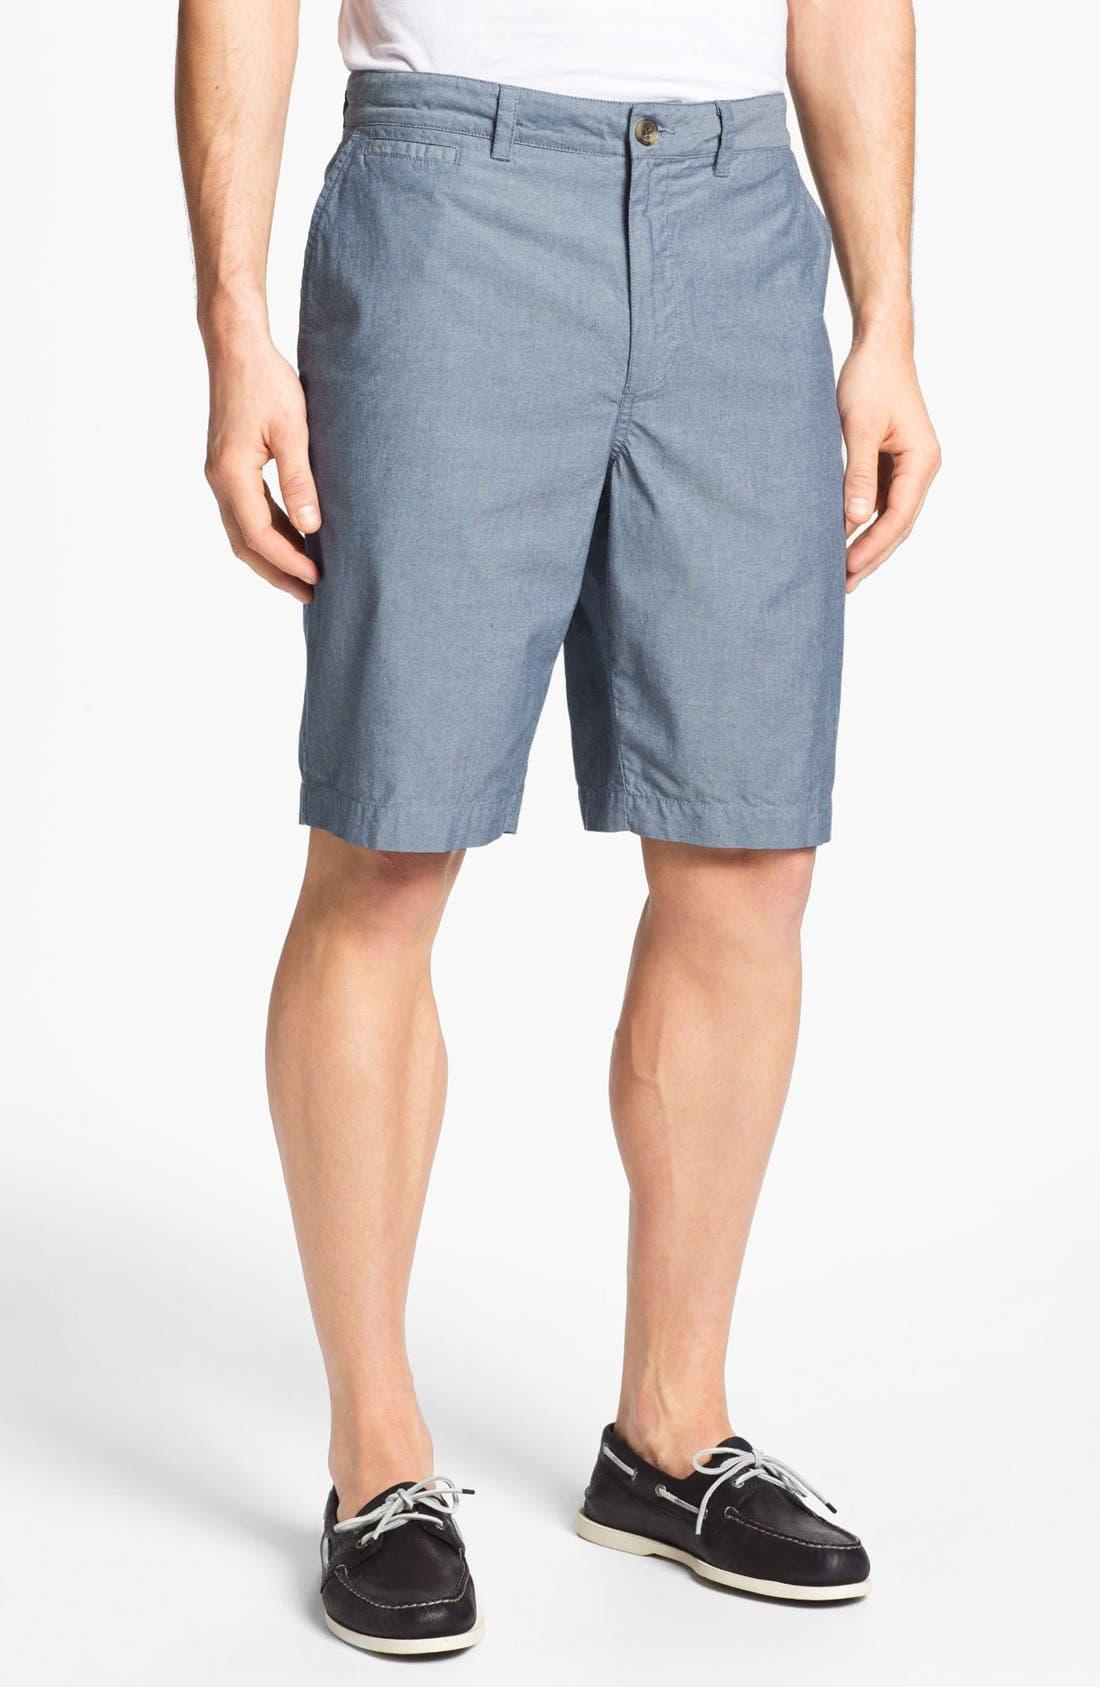 Alternate Image 1 Selected - Wallin & Bros. 'Lanspur' Chambray Shorts